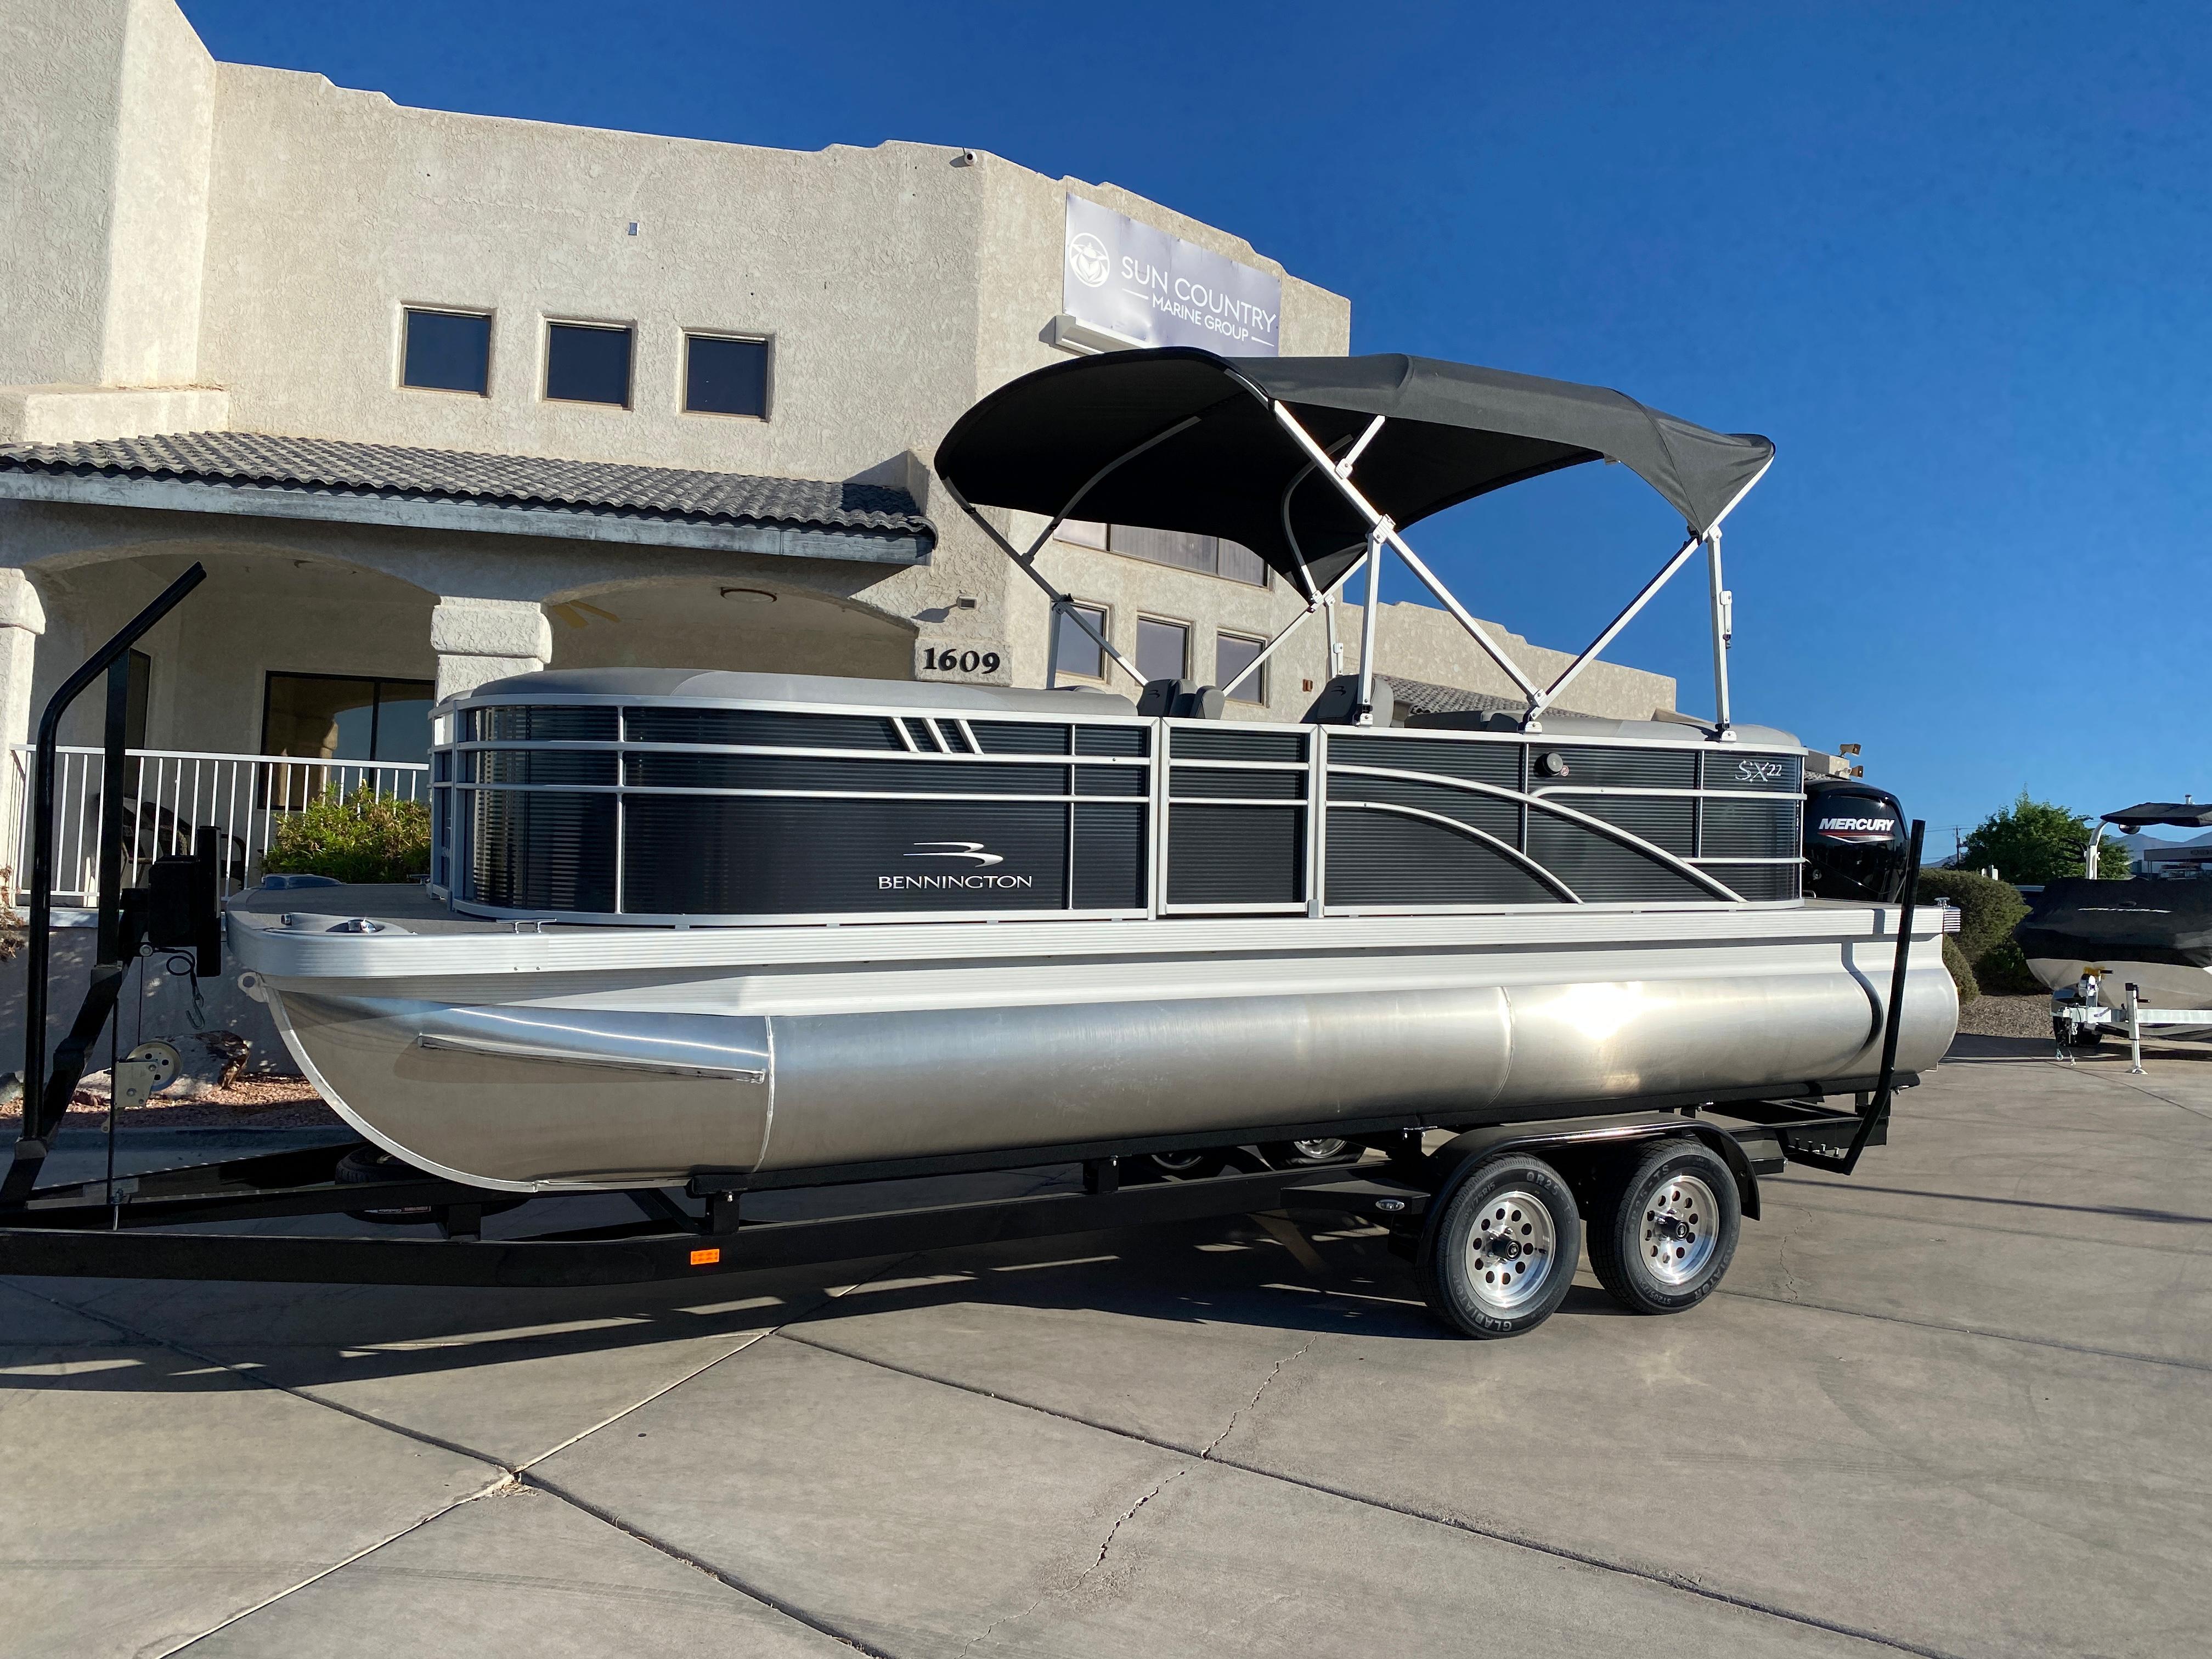 2021 Bennington 22 SSRX #B8542H inventory image at Sun Country Inland in Lake Havasu City